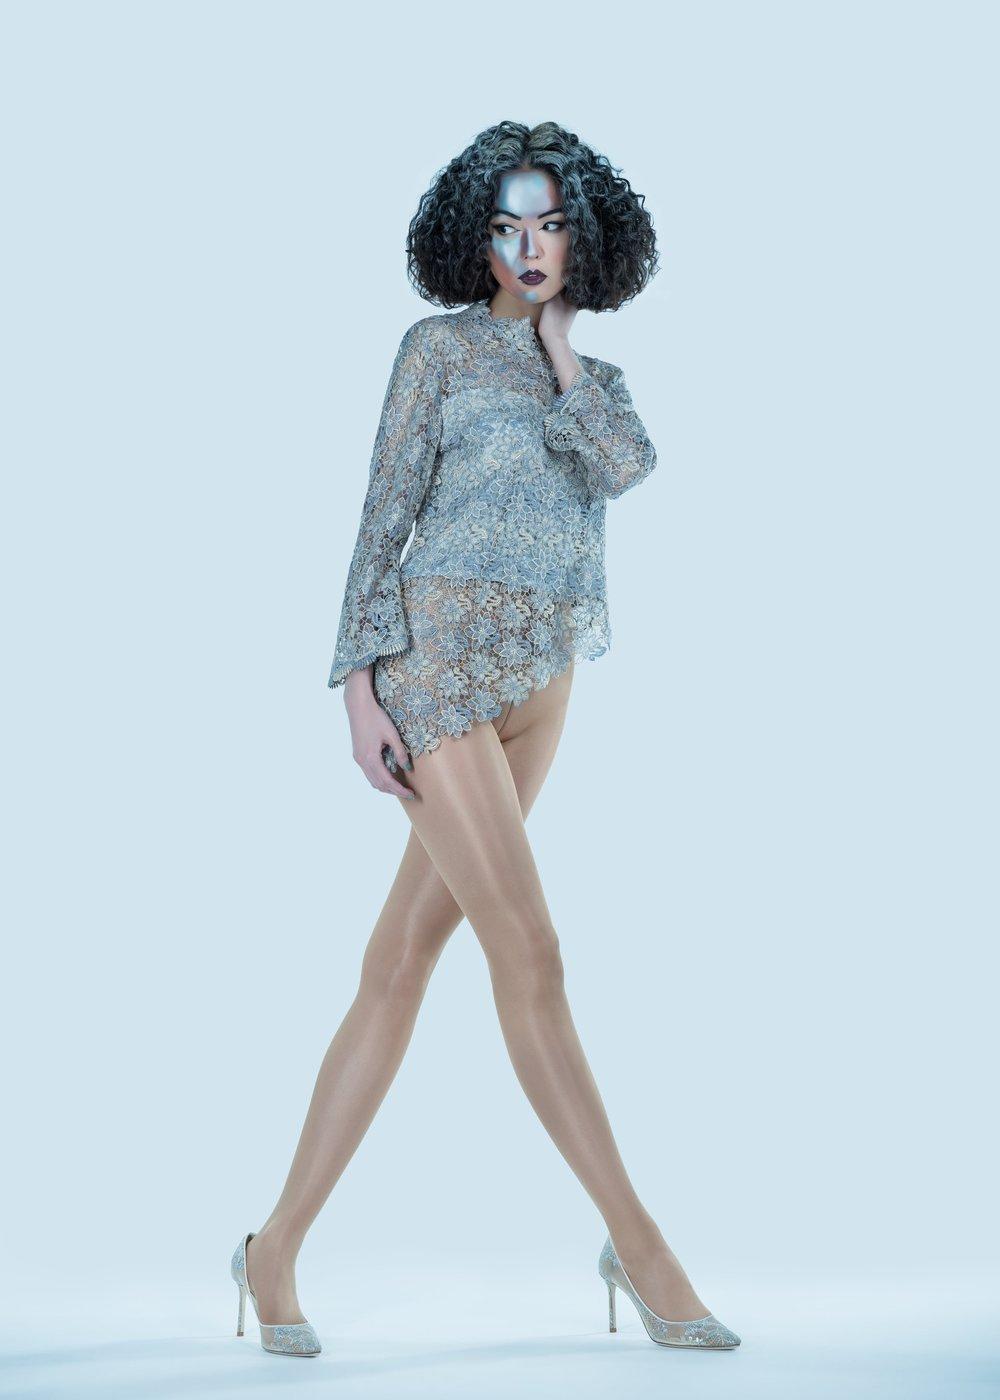 Futuristic Shoot Tan Legs.jpg